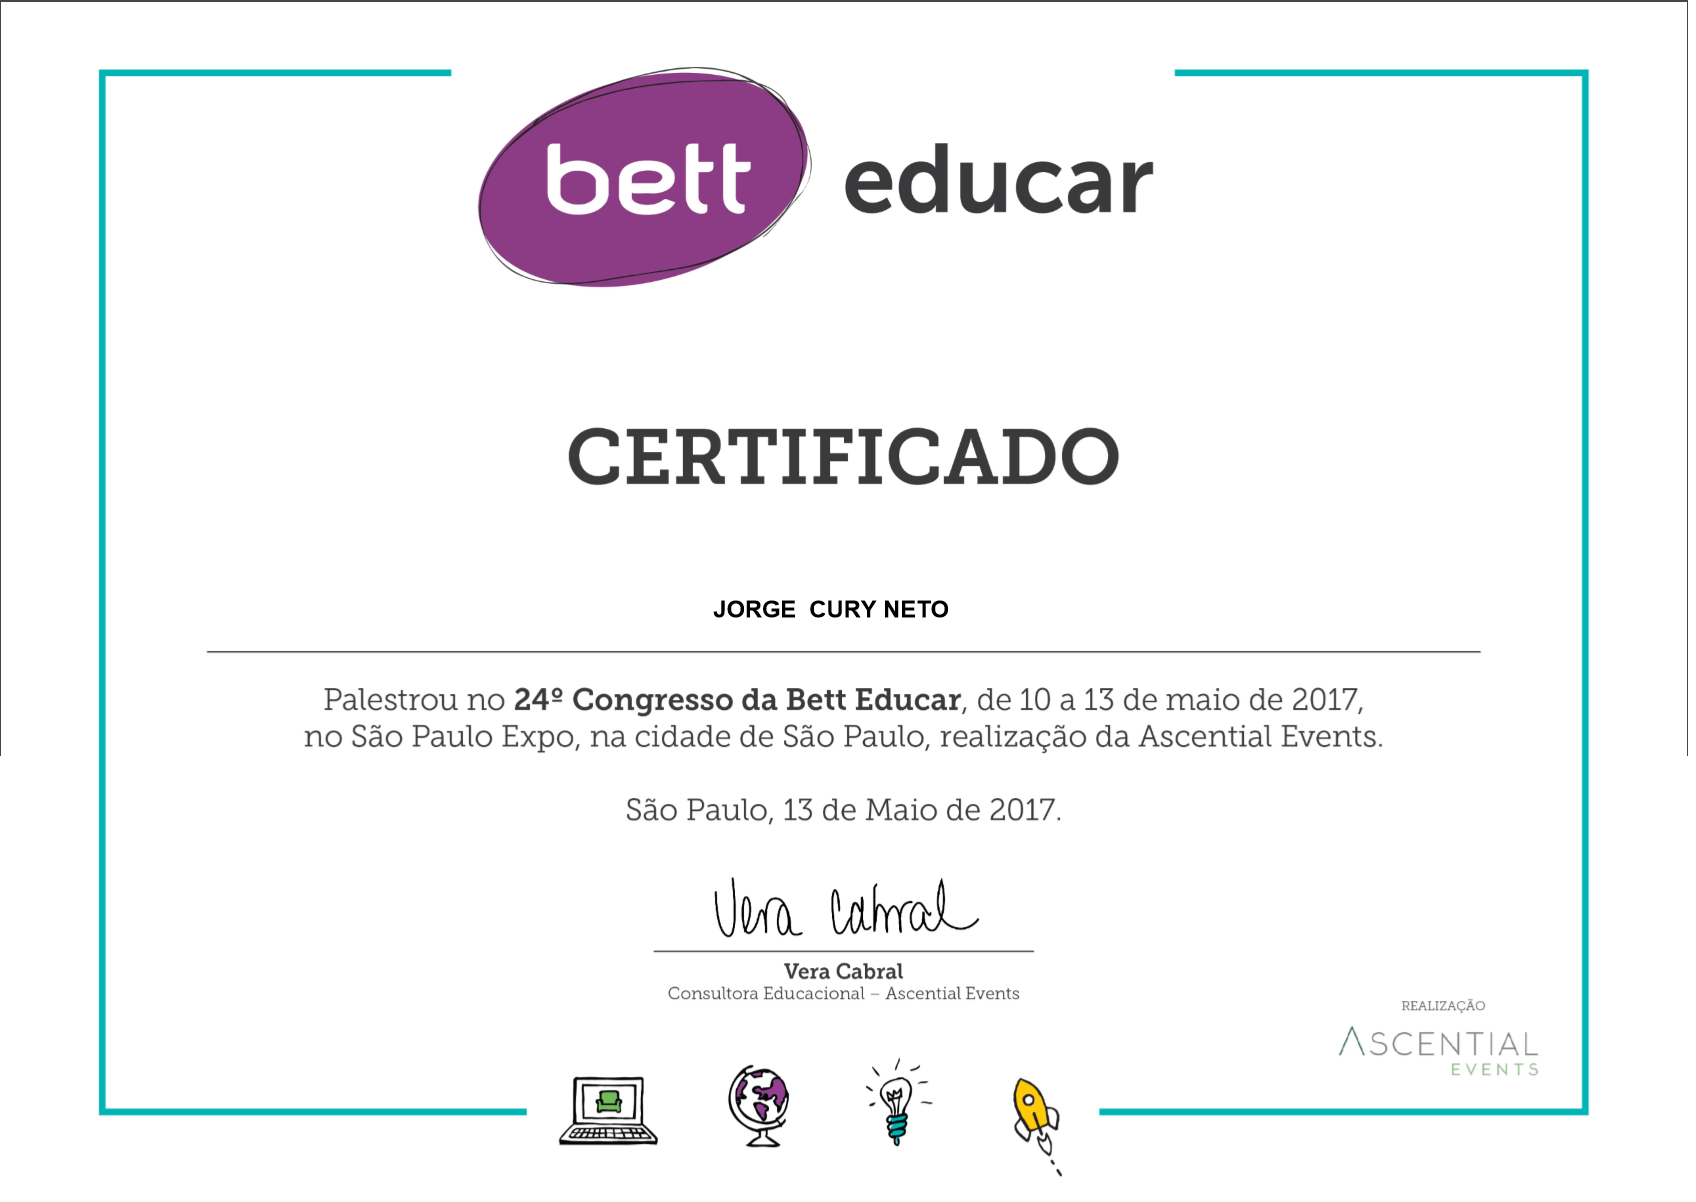 CertificadoBettEducar